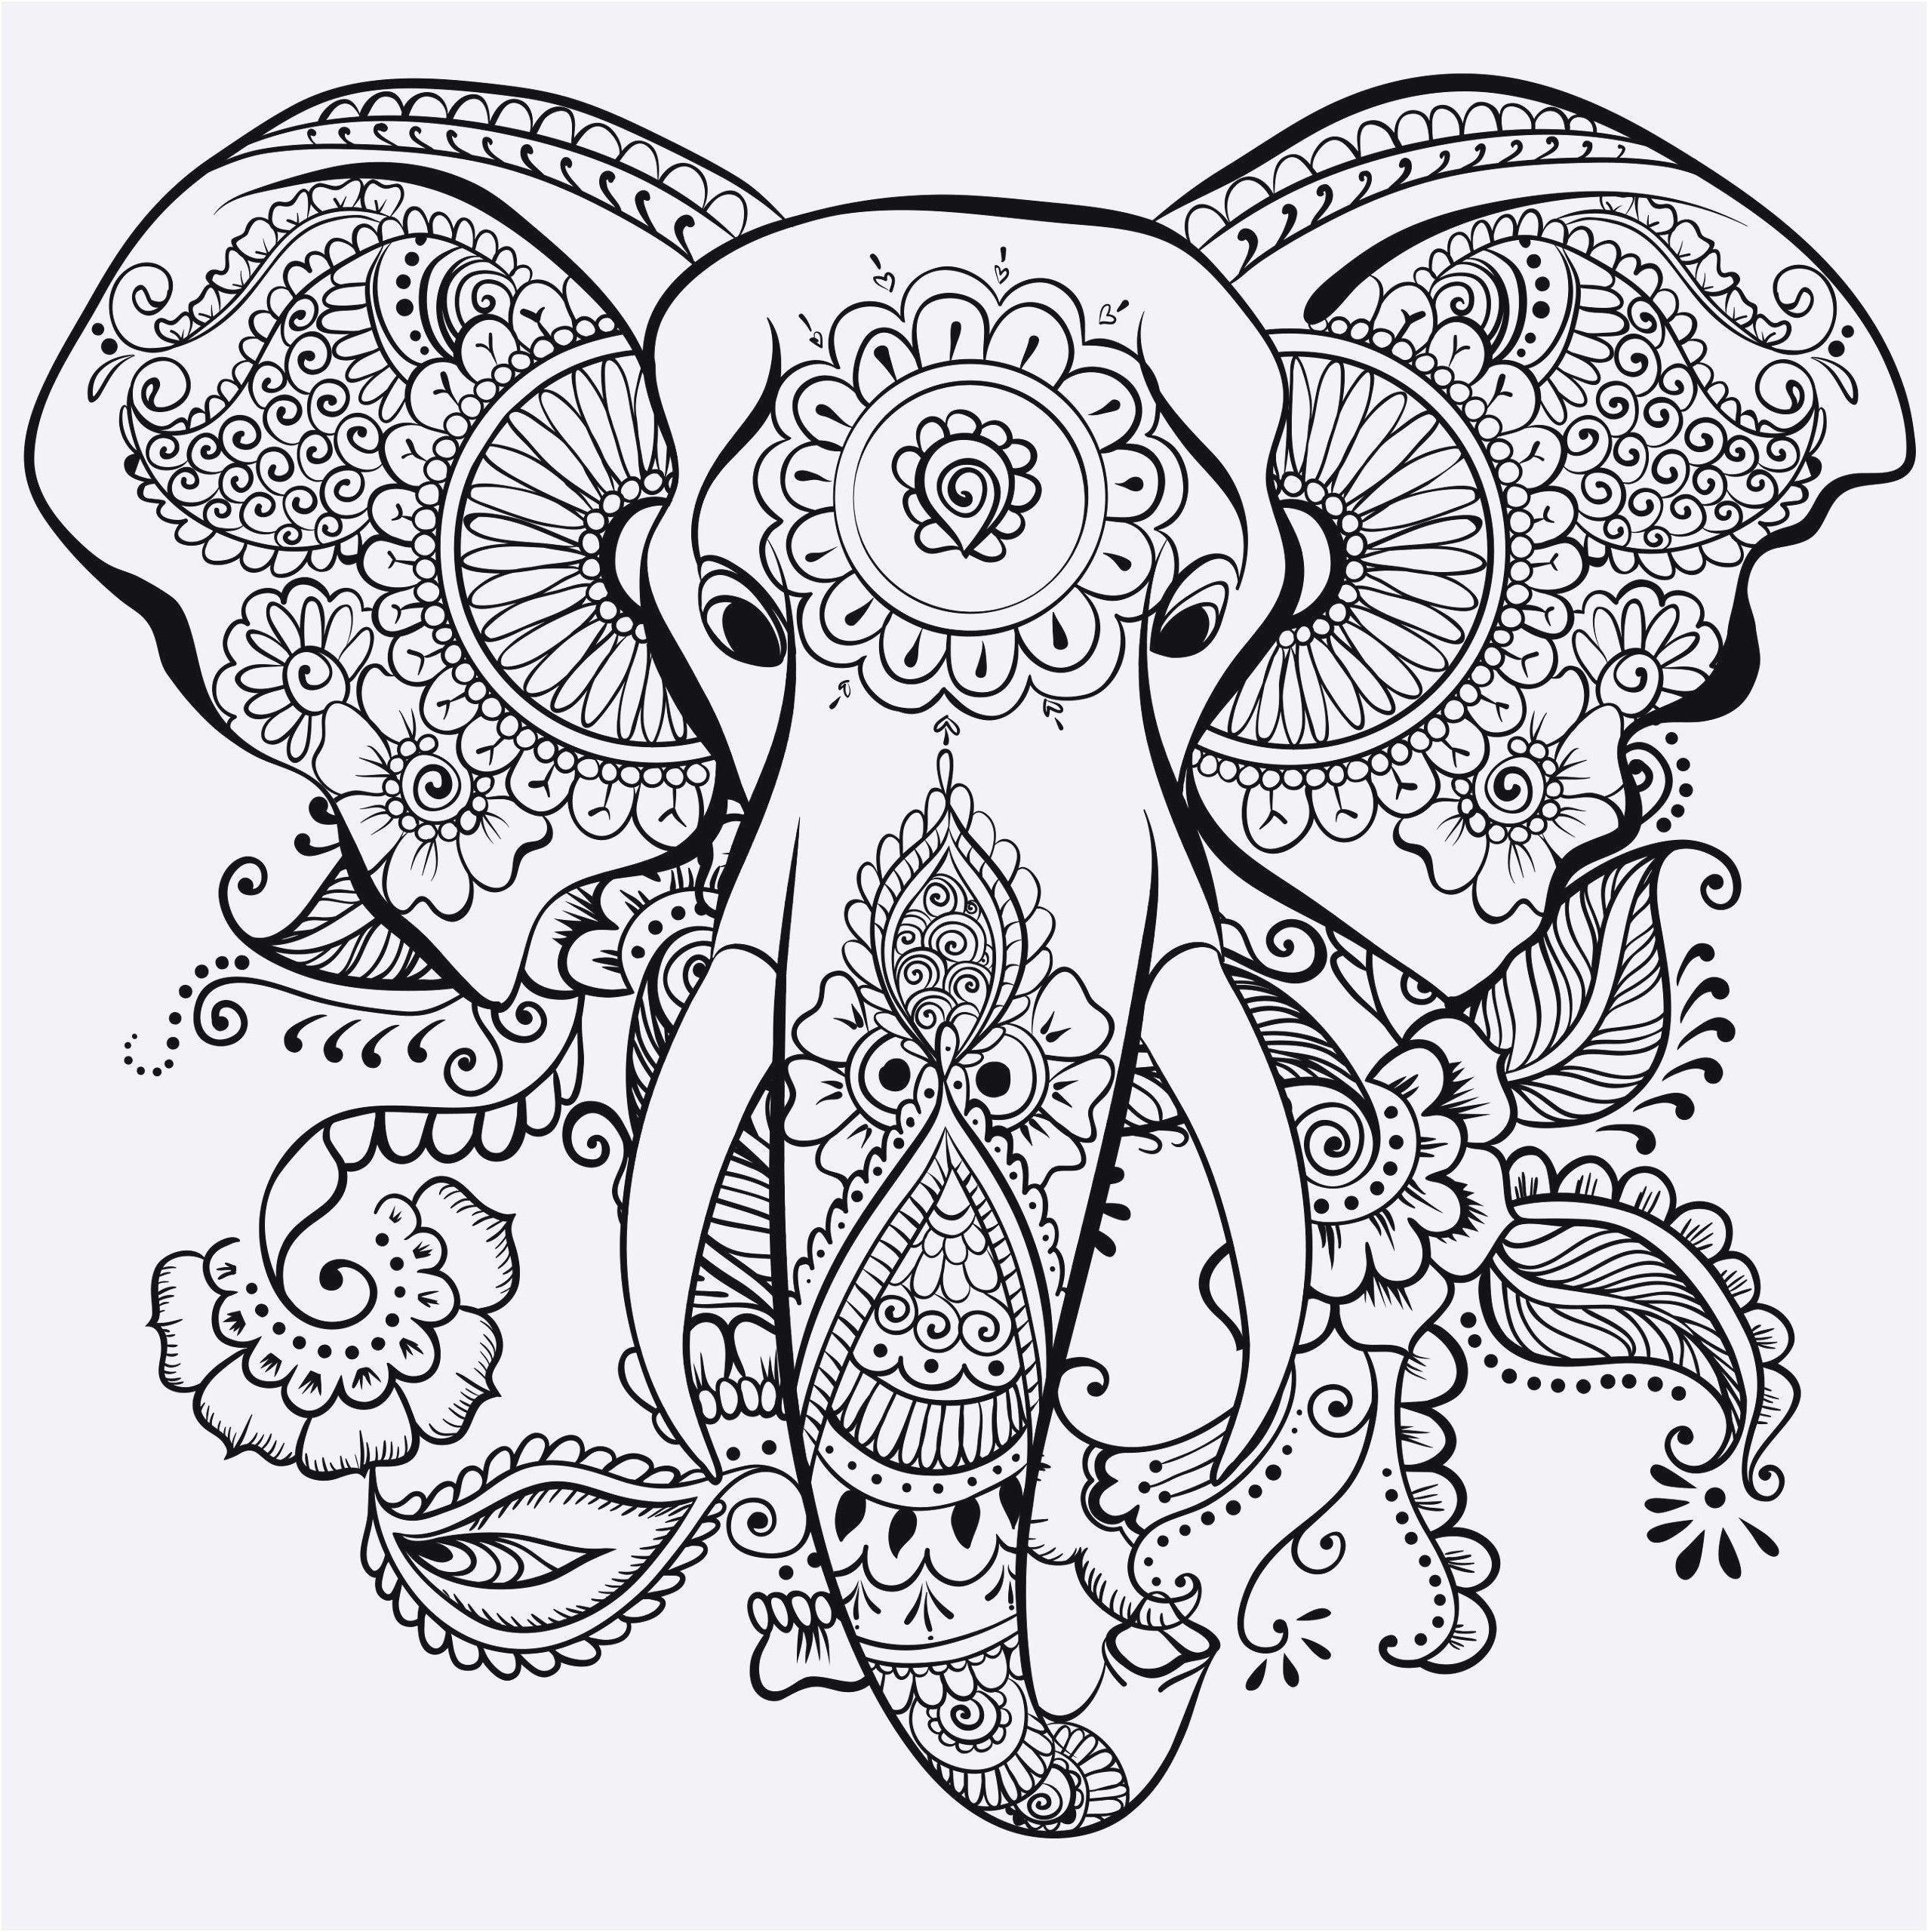 Malvorlagen Malvorlagenkostenlos Check More At Https Coloring Ae Photo De Malvorlagen Kin Elephant Coloring Page Lion Coloring Pages Mandala Coloring Pages